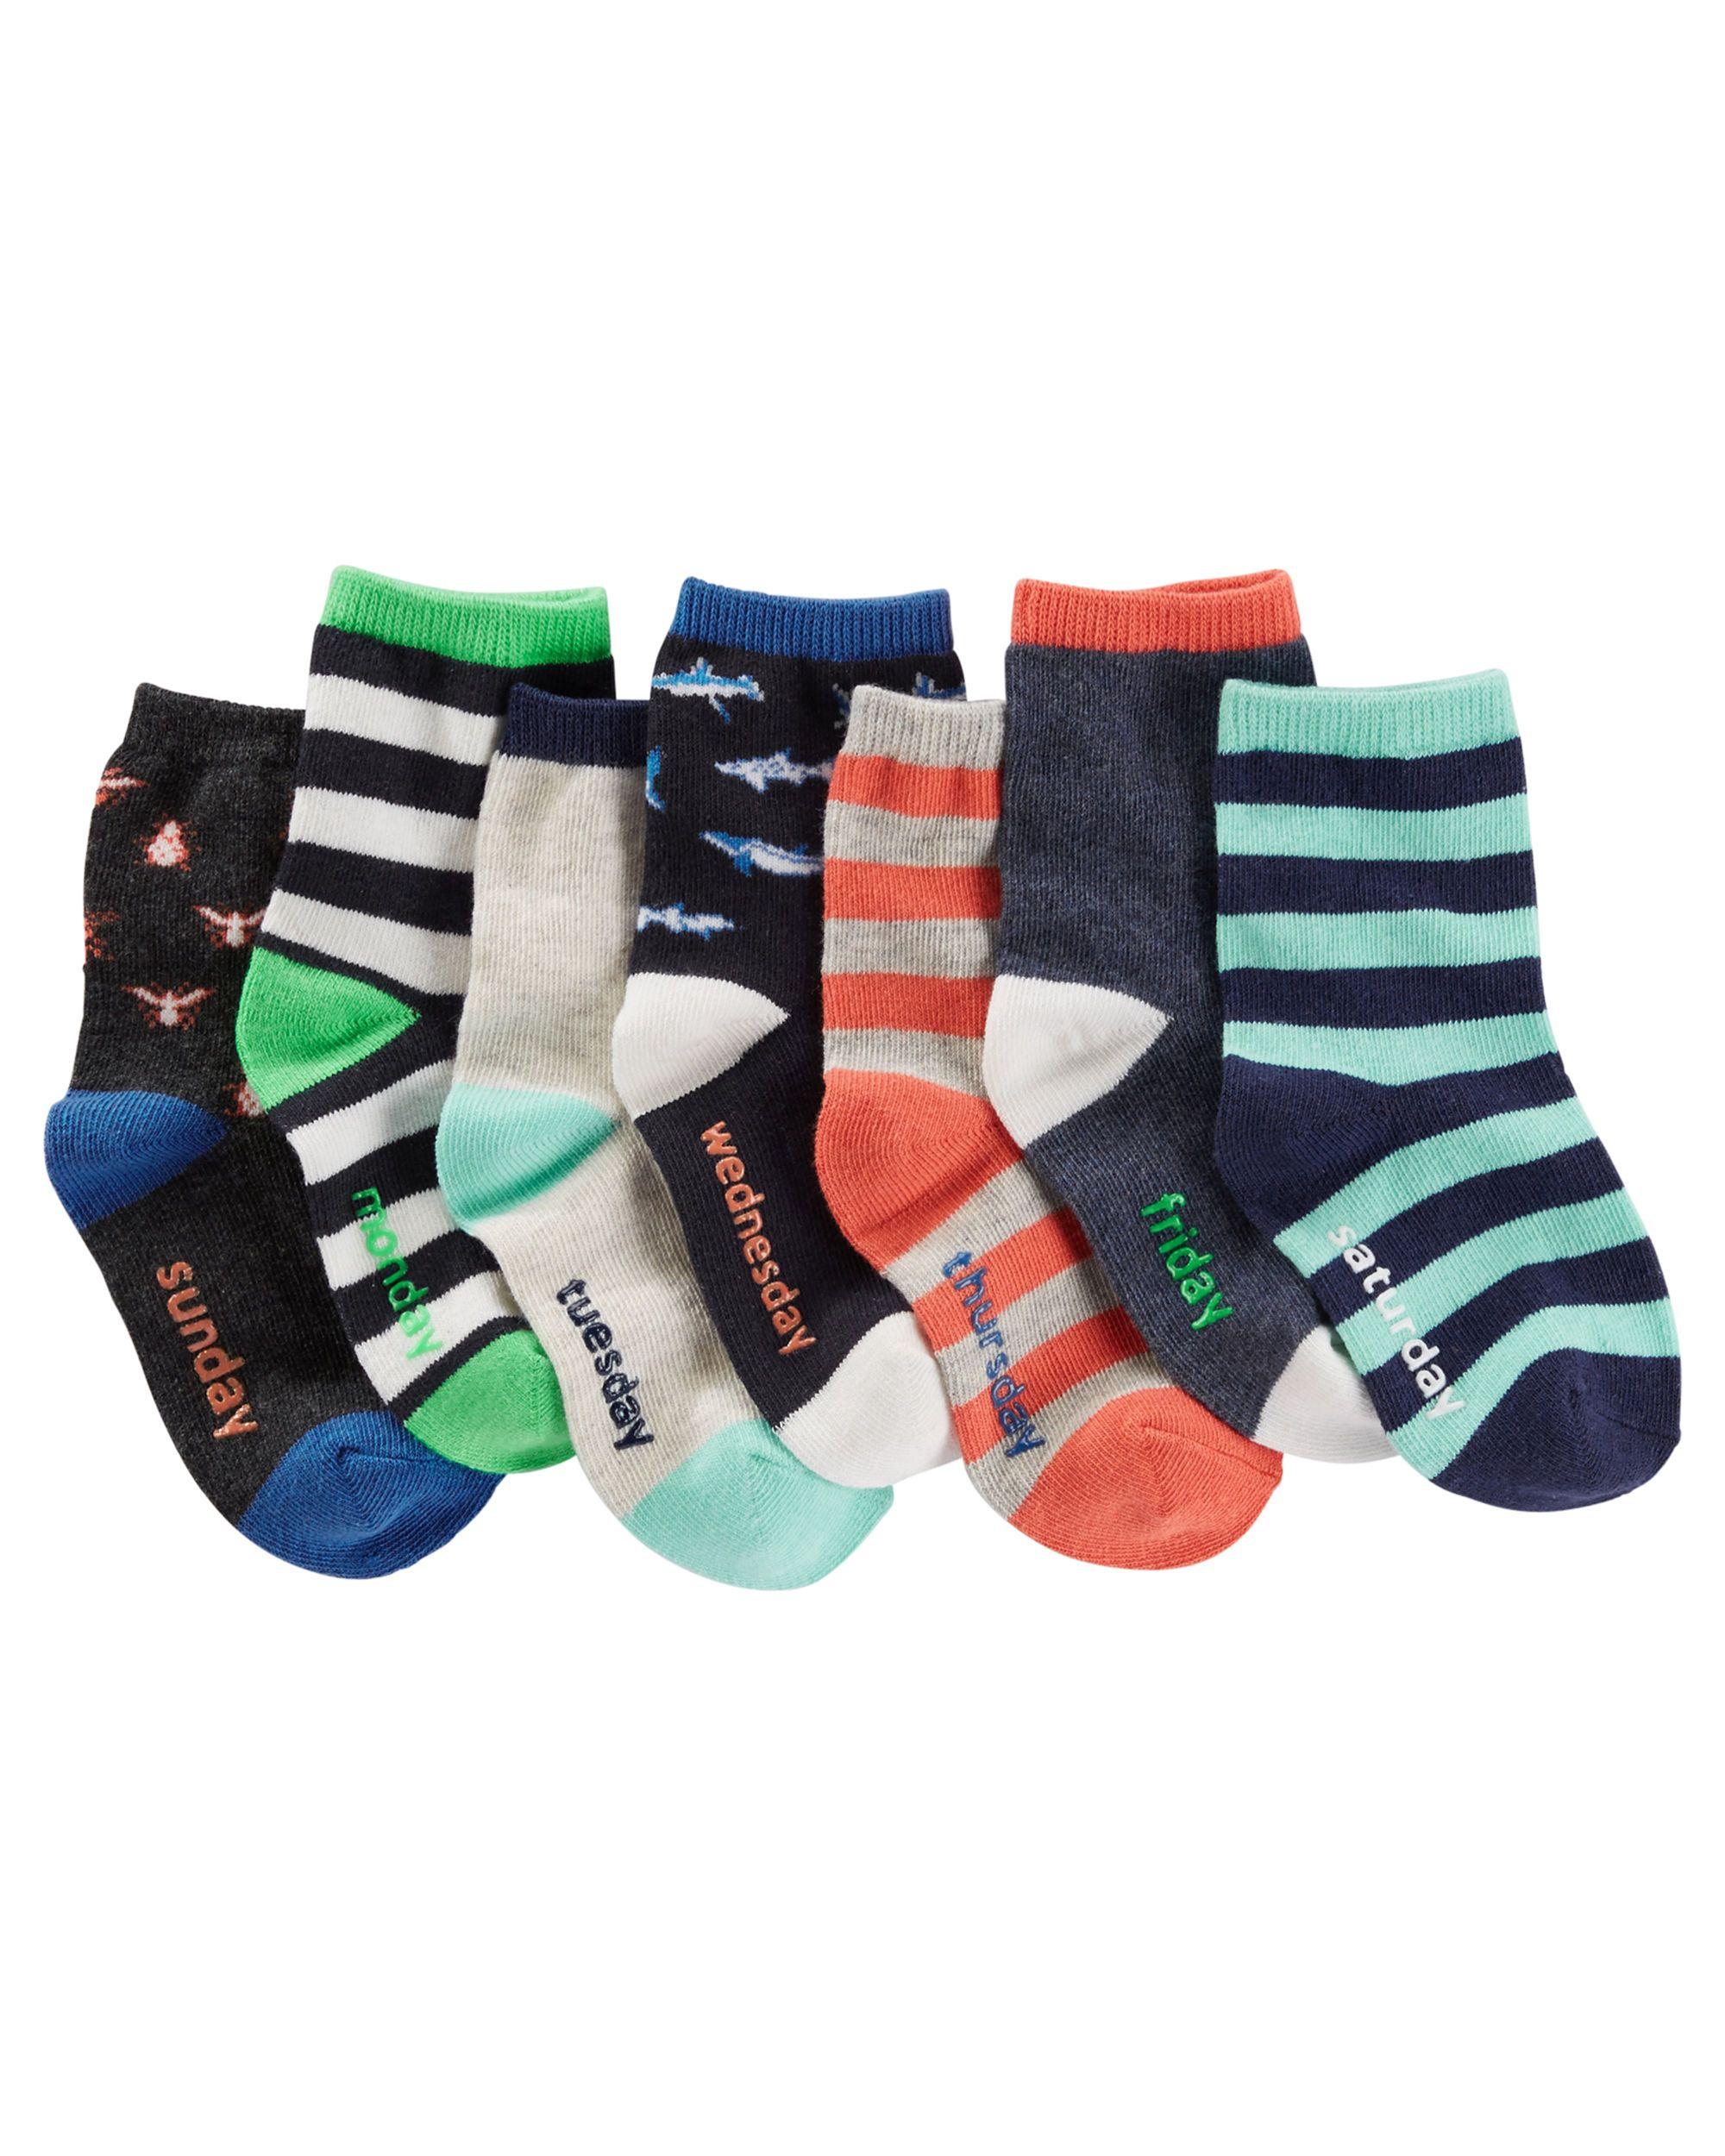 Days Of The Week Socks 7 Pack Glowing Days Of The Week Socks Baby Boy Accessories Boys